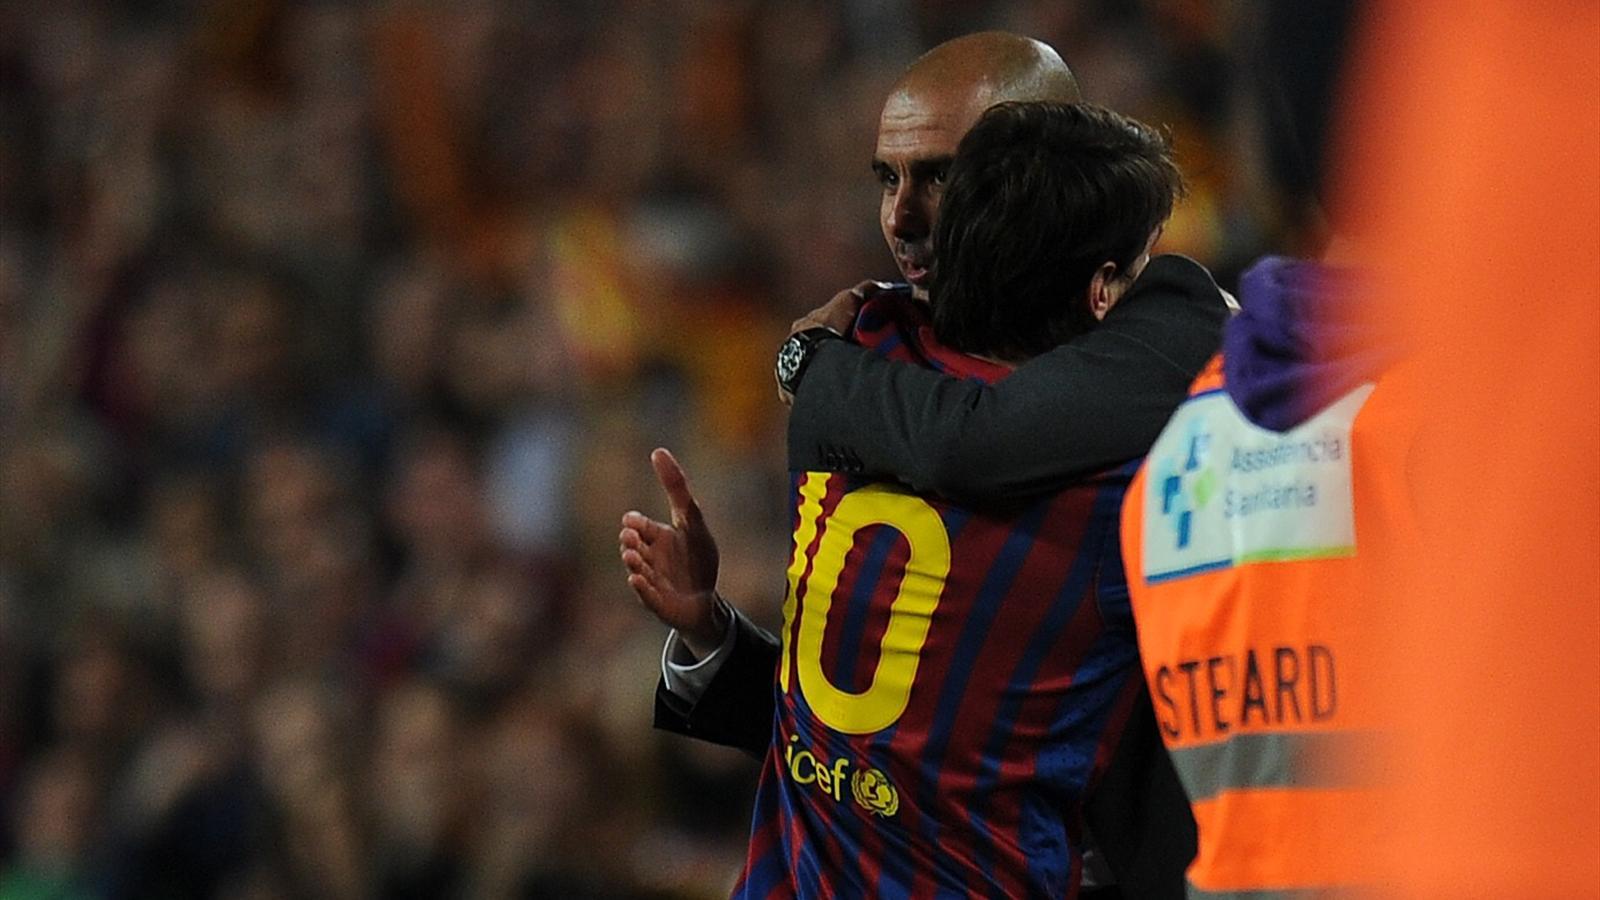 Josep Guardiola et Lionel Messi lors de Barça-Espanyol - 2012